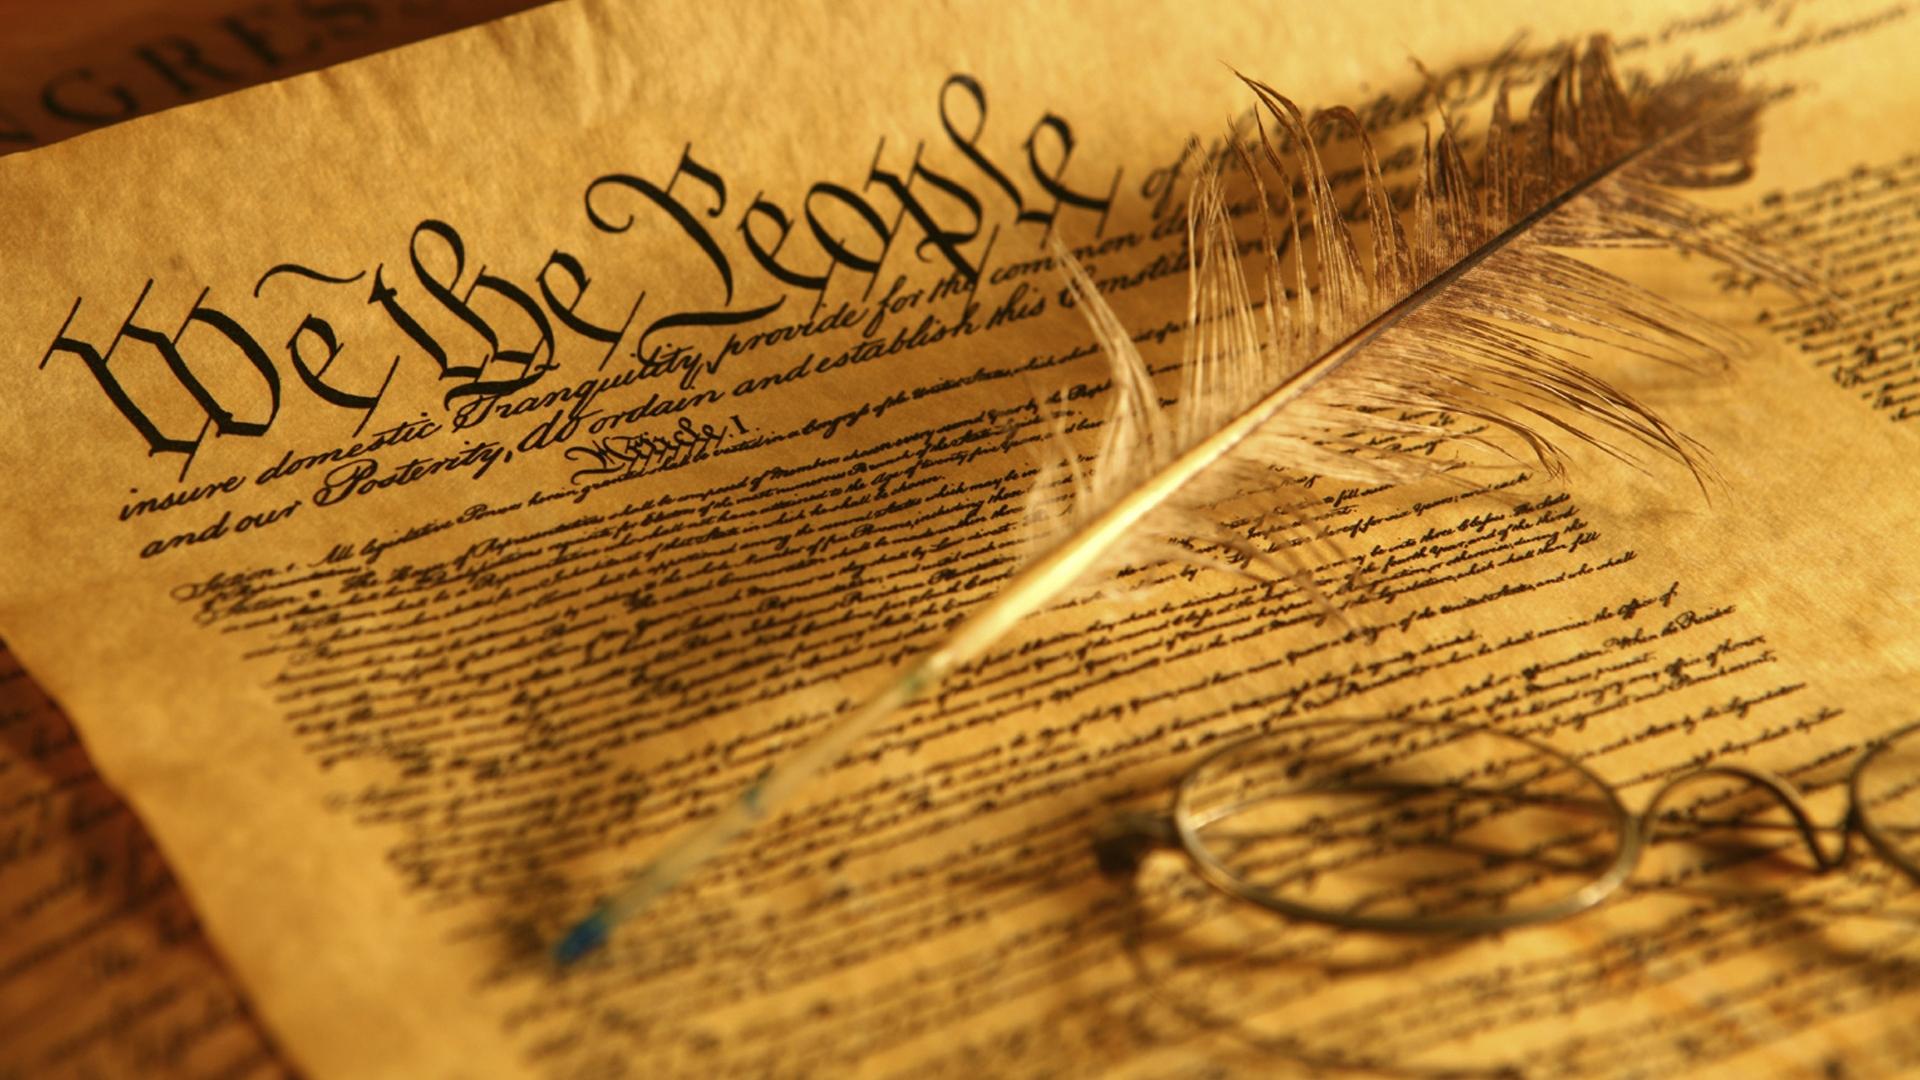 Best 48 Constitution Wallpaper on HipWallpaper Constitution 1920x1080